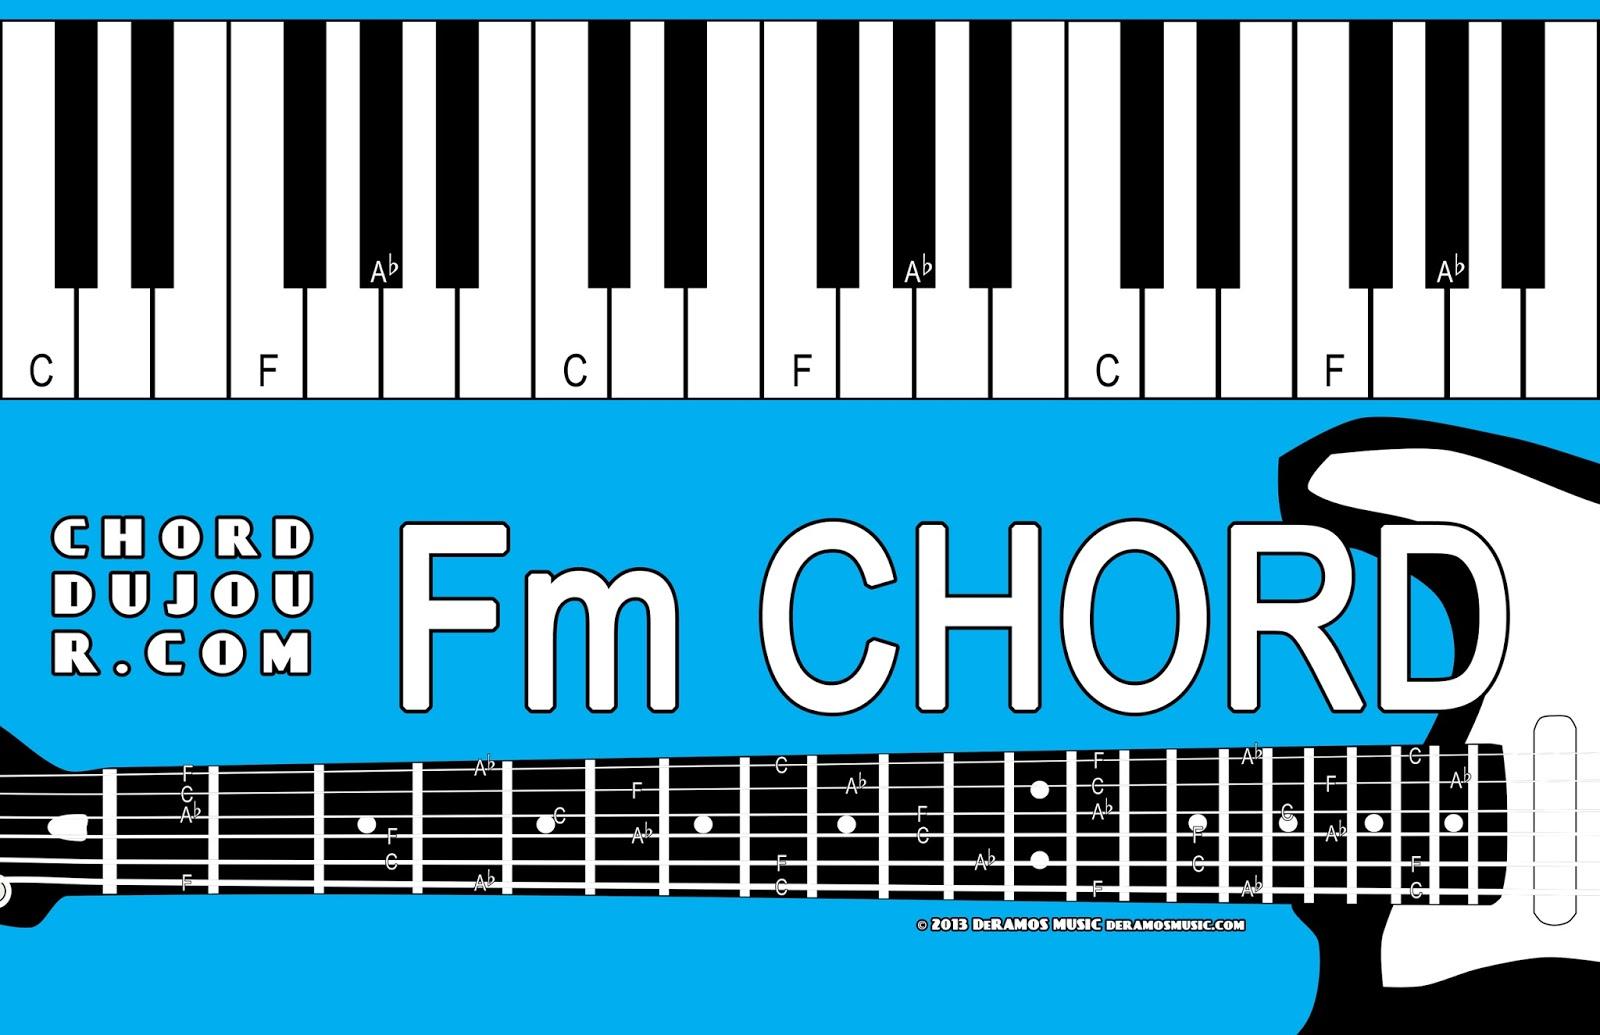 Chord du jour dictionary fm chord dictionary fm chord hexwebz Gallery